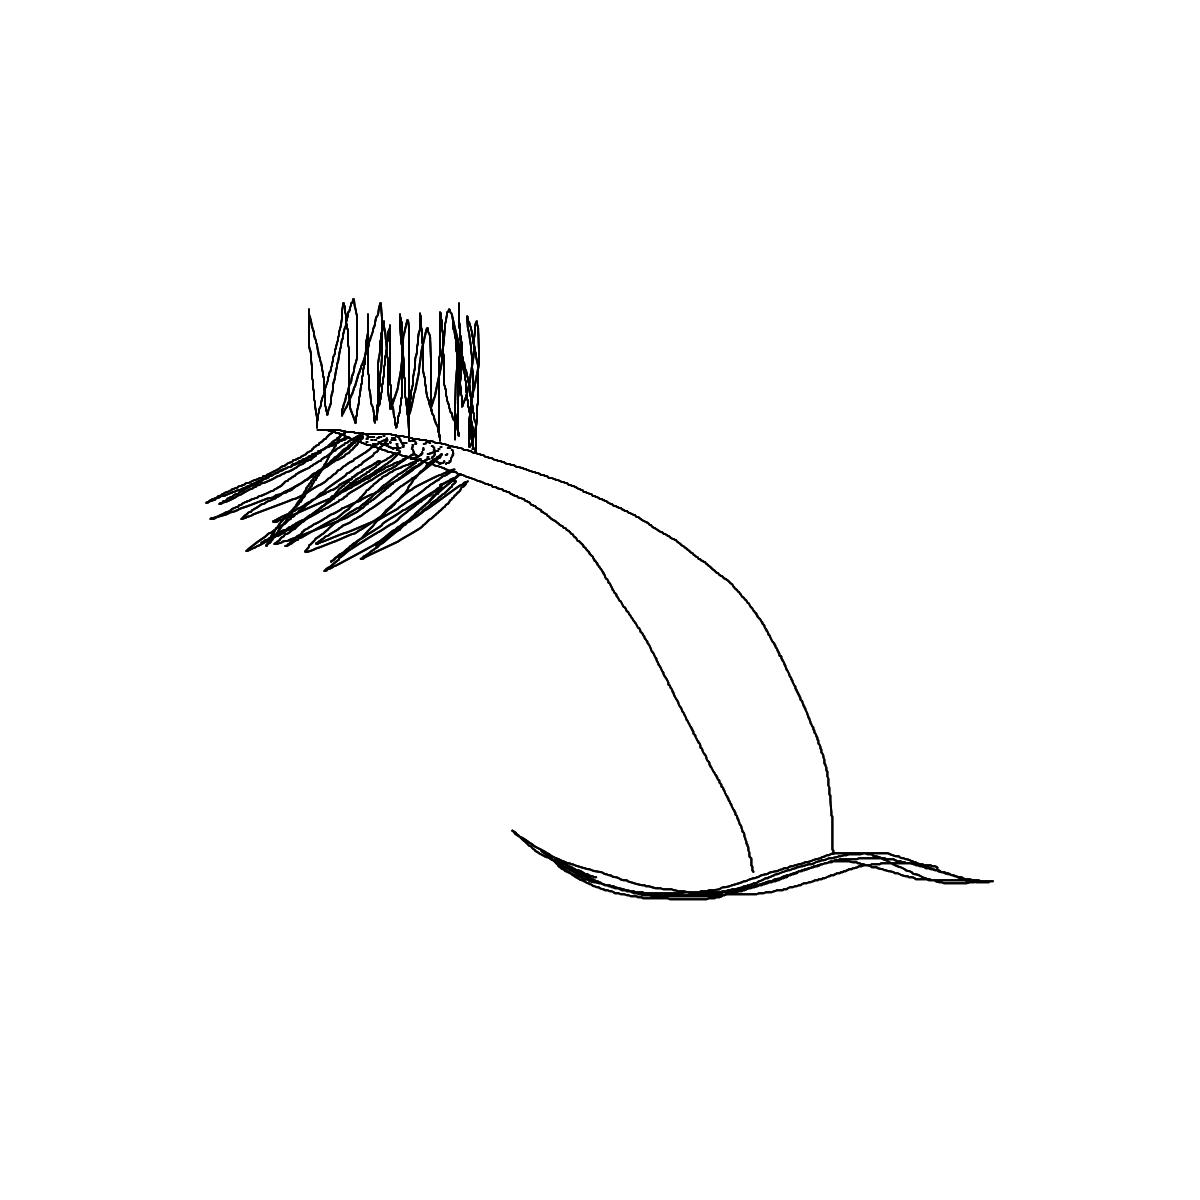 BAAAM drawing#2253 lat:43.4005241394043000lng: -1.7706478834152222